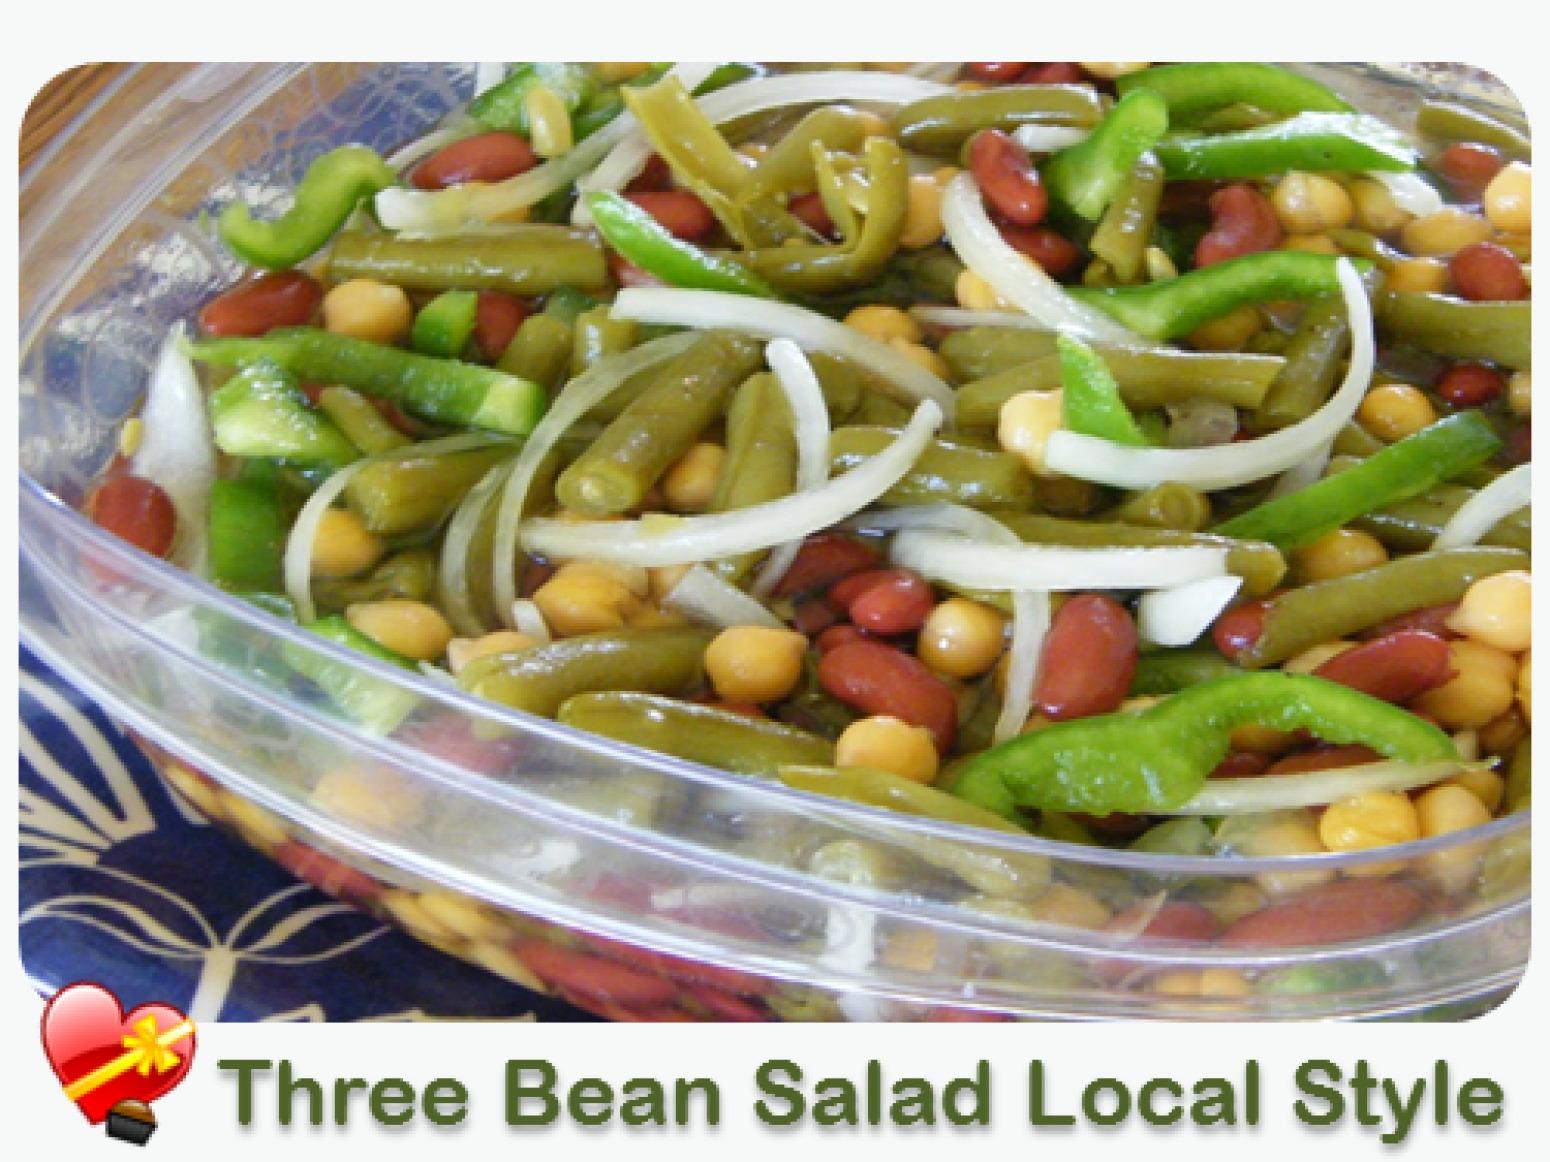 Three Bean Salad Recipe 14 | Just A Pinch Recipes